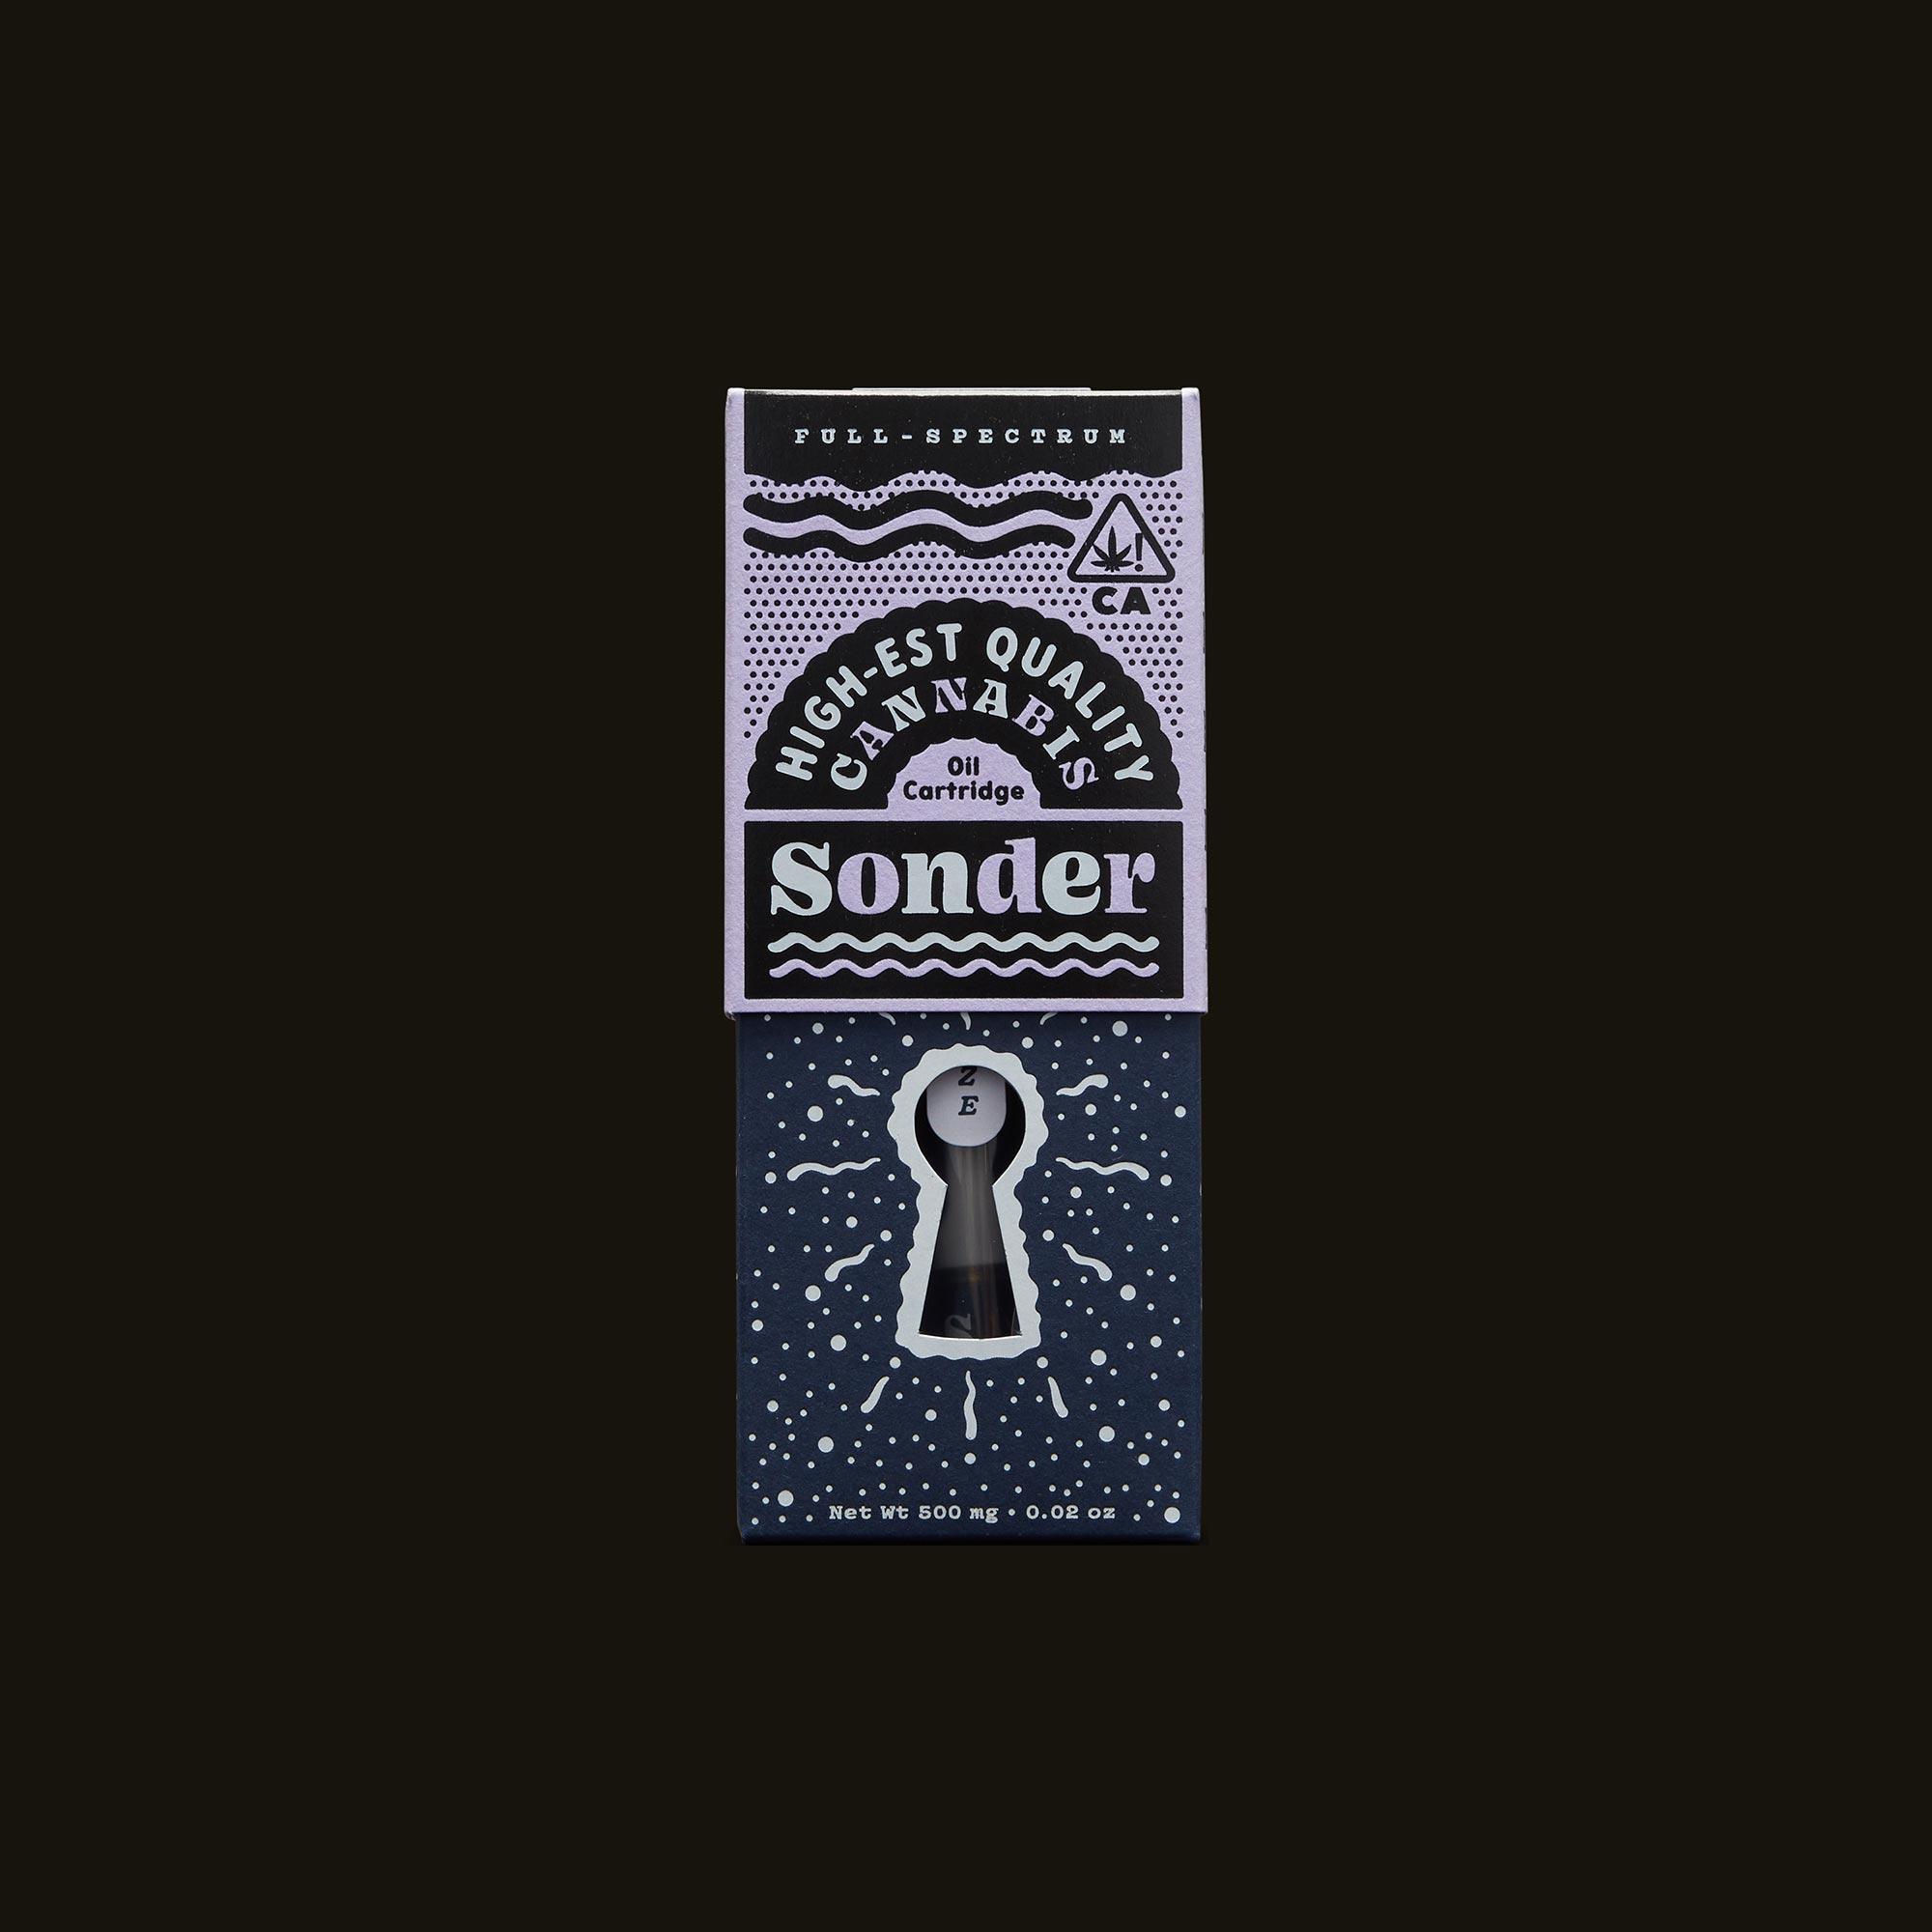 Sonder Gorilla No. 4 Cartridge